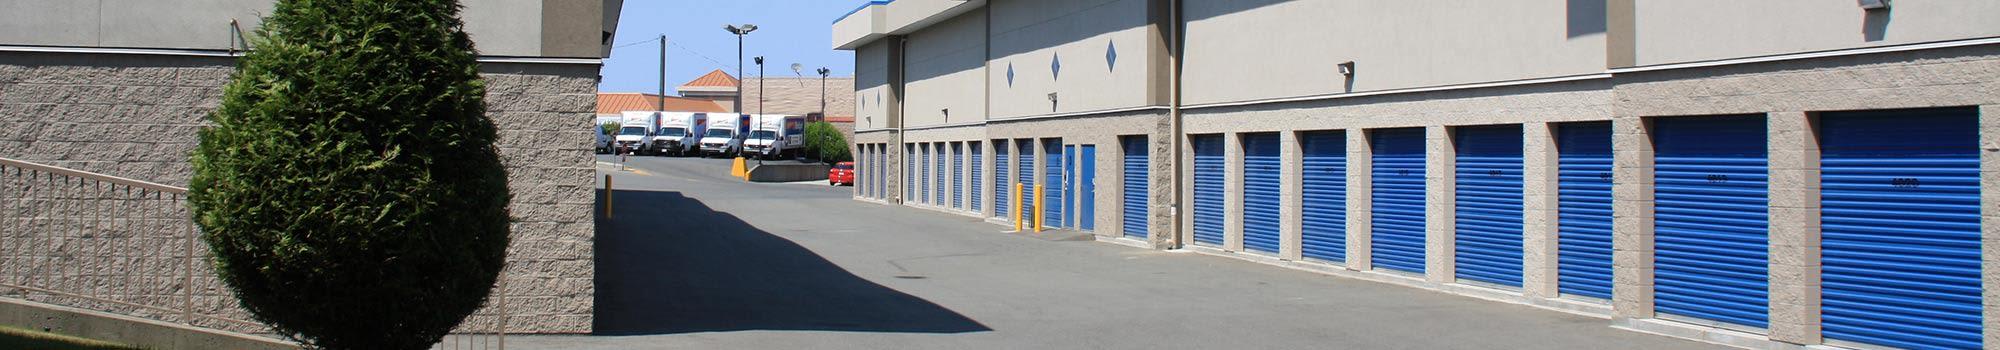 Self storage units in Nanaimo